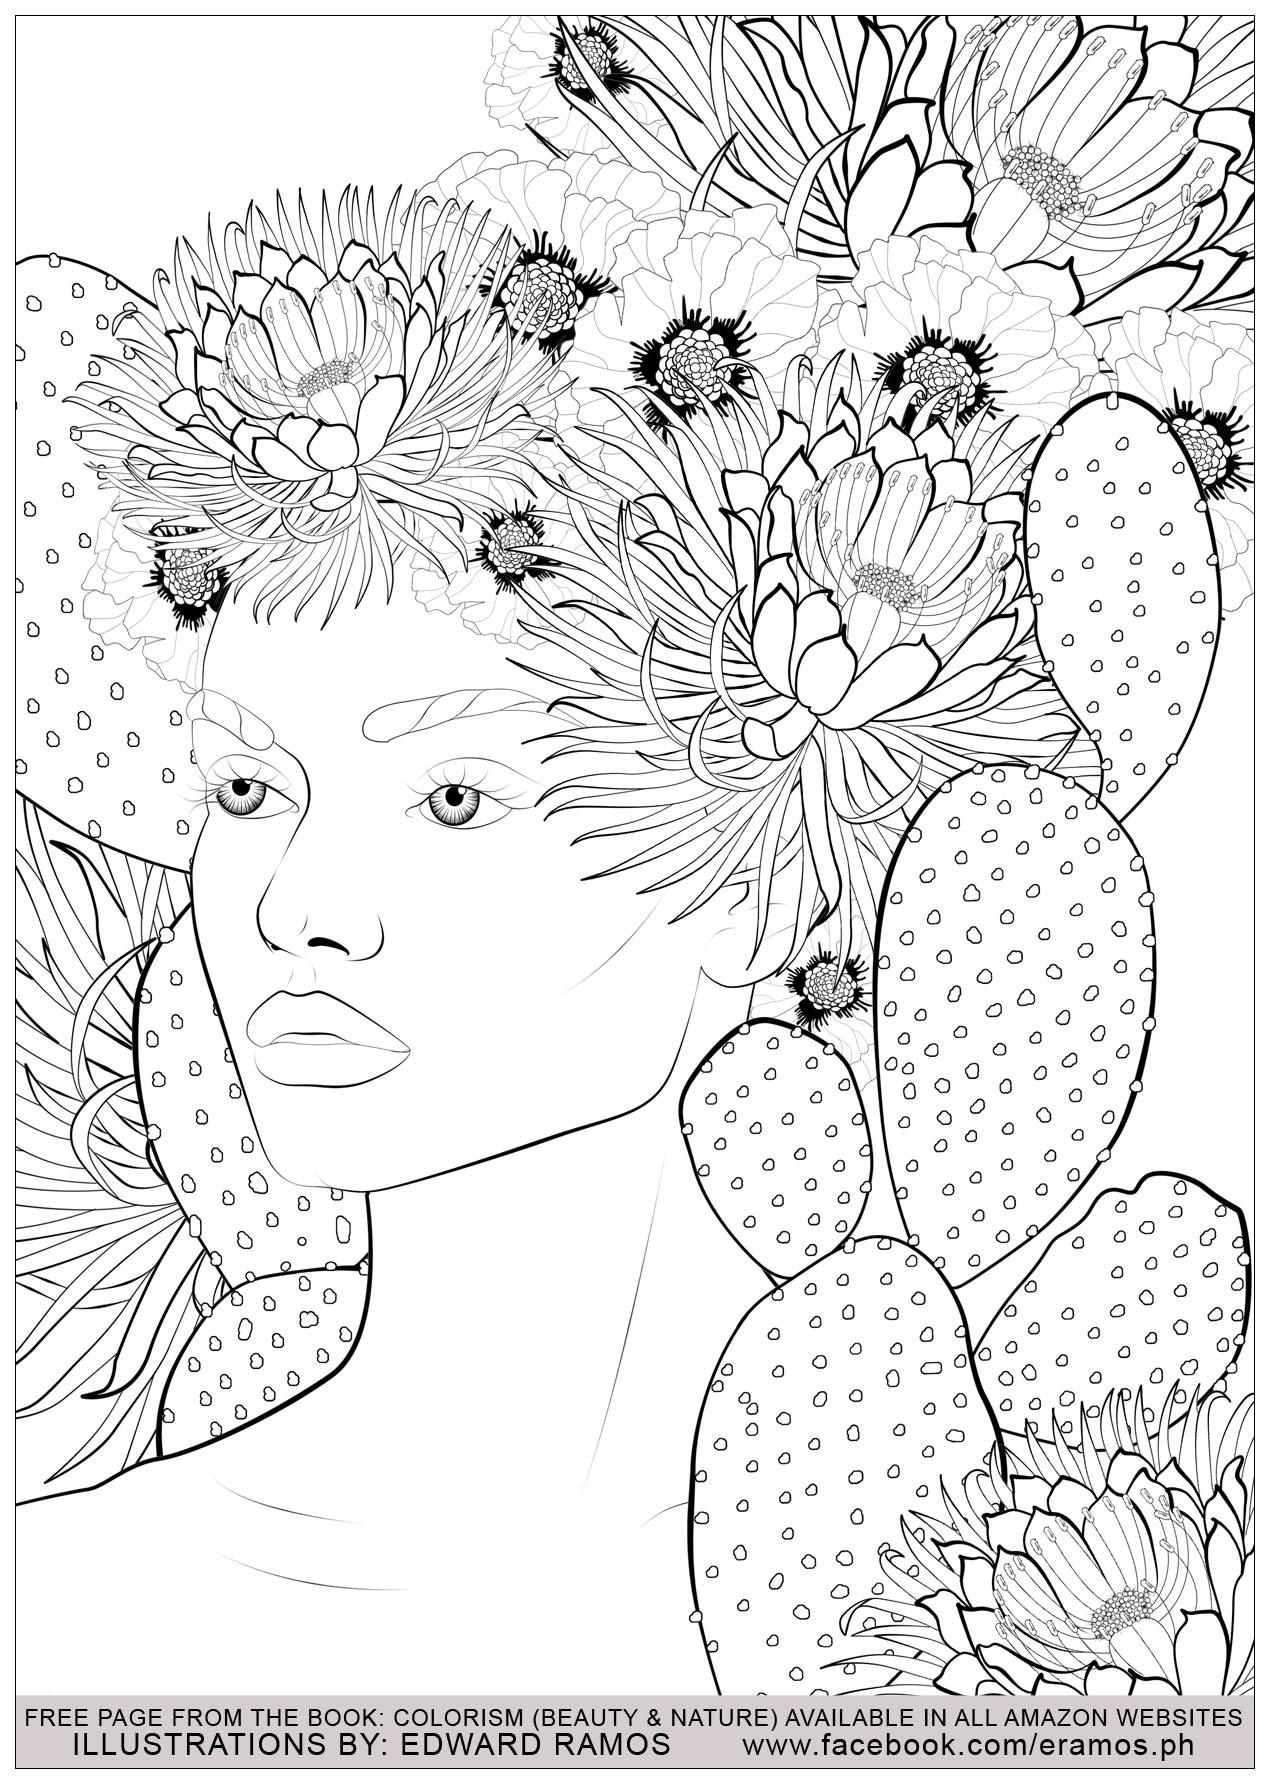 Coloring beauty and nature edward ramos 13